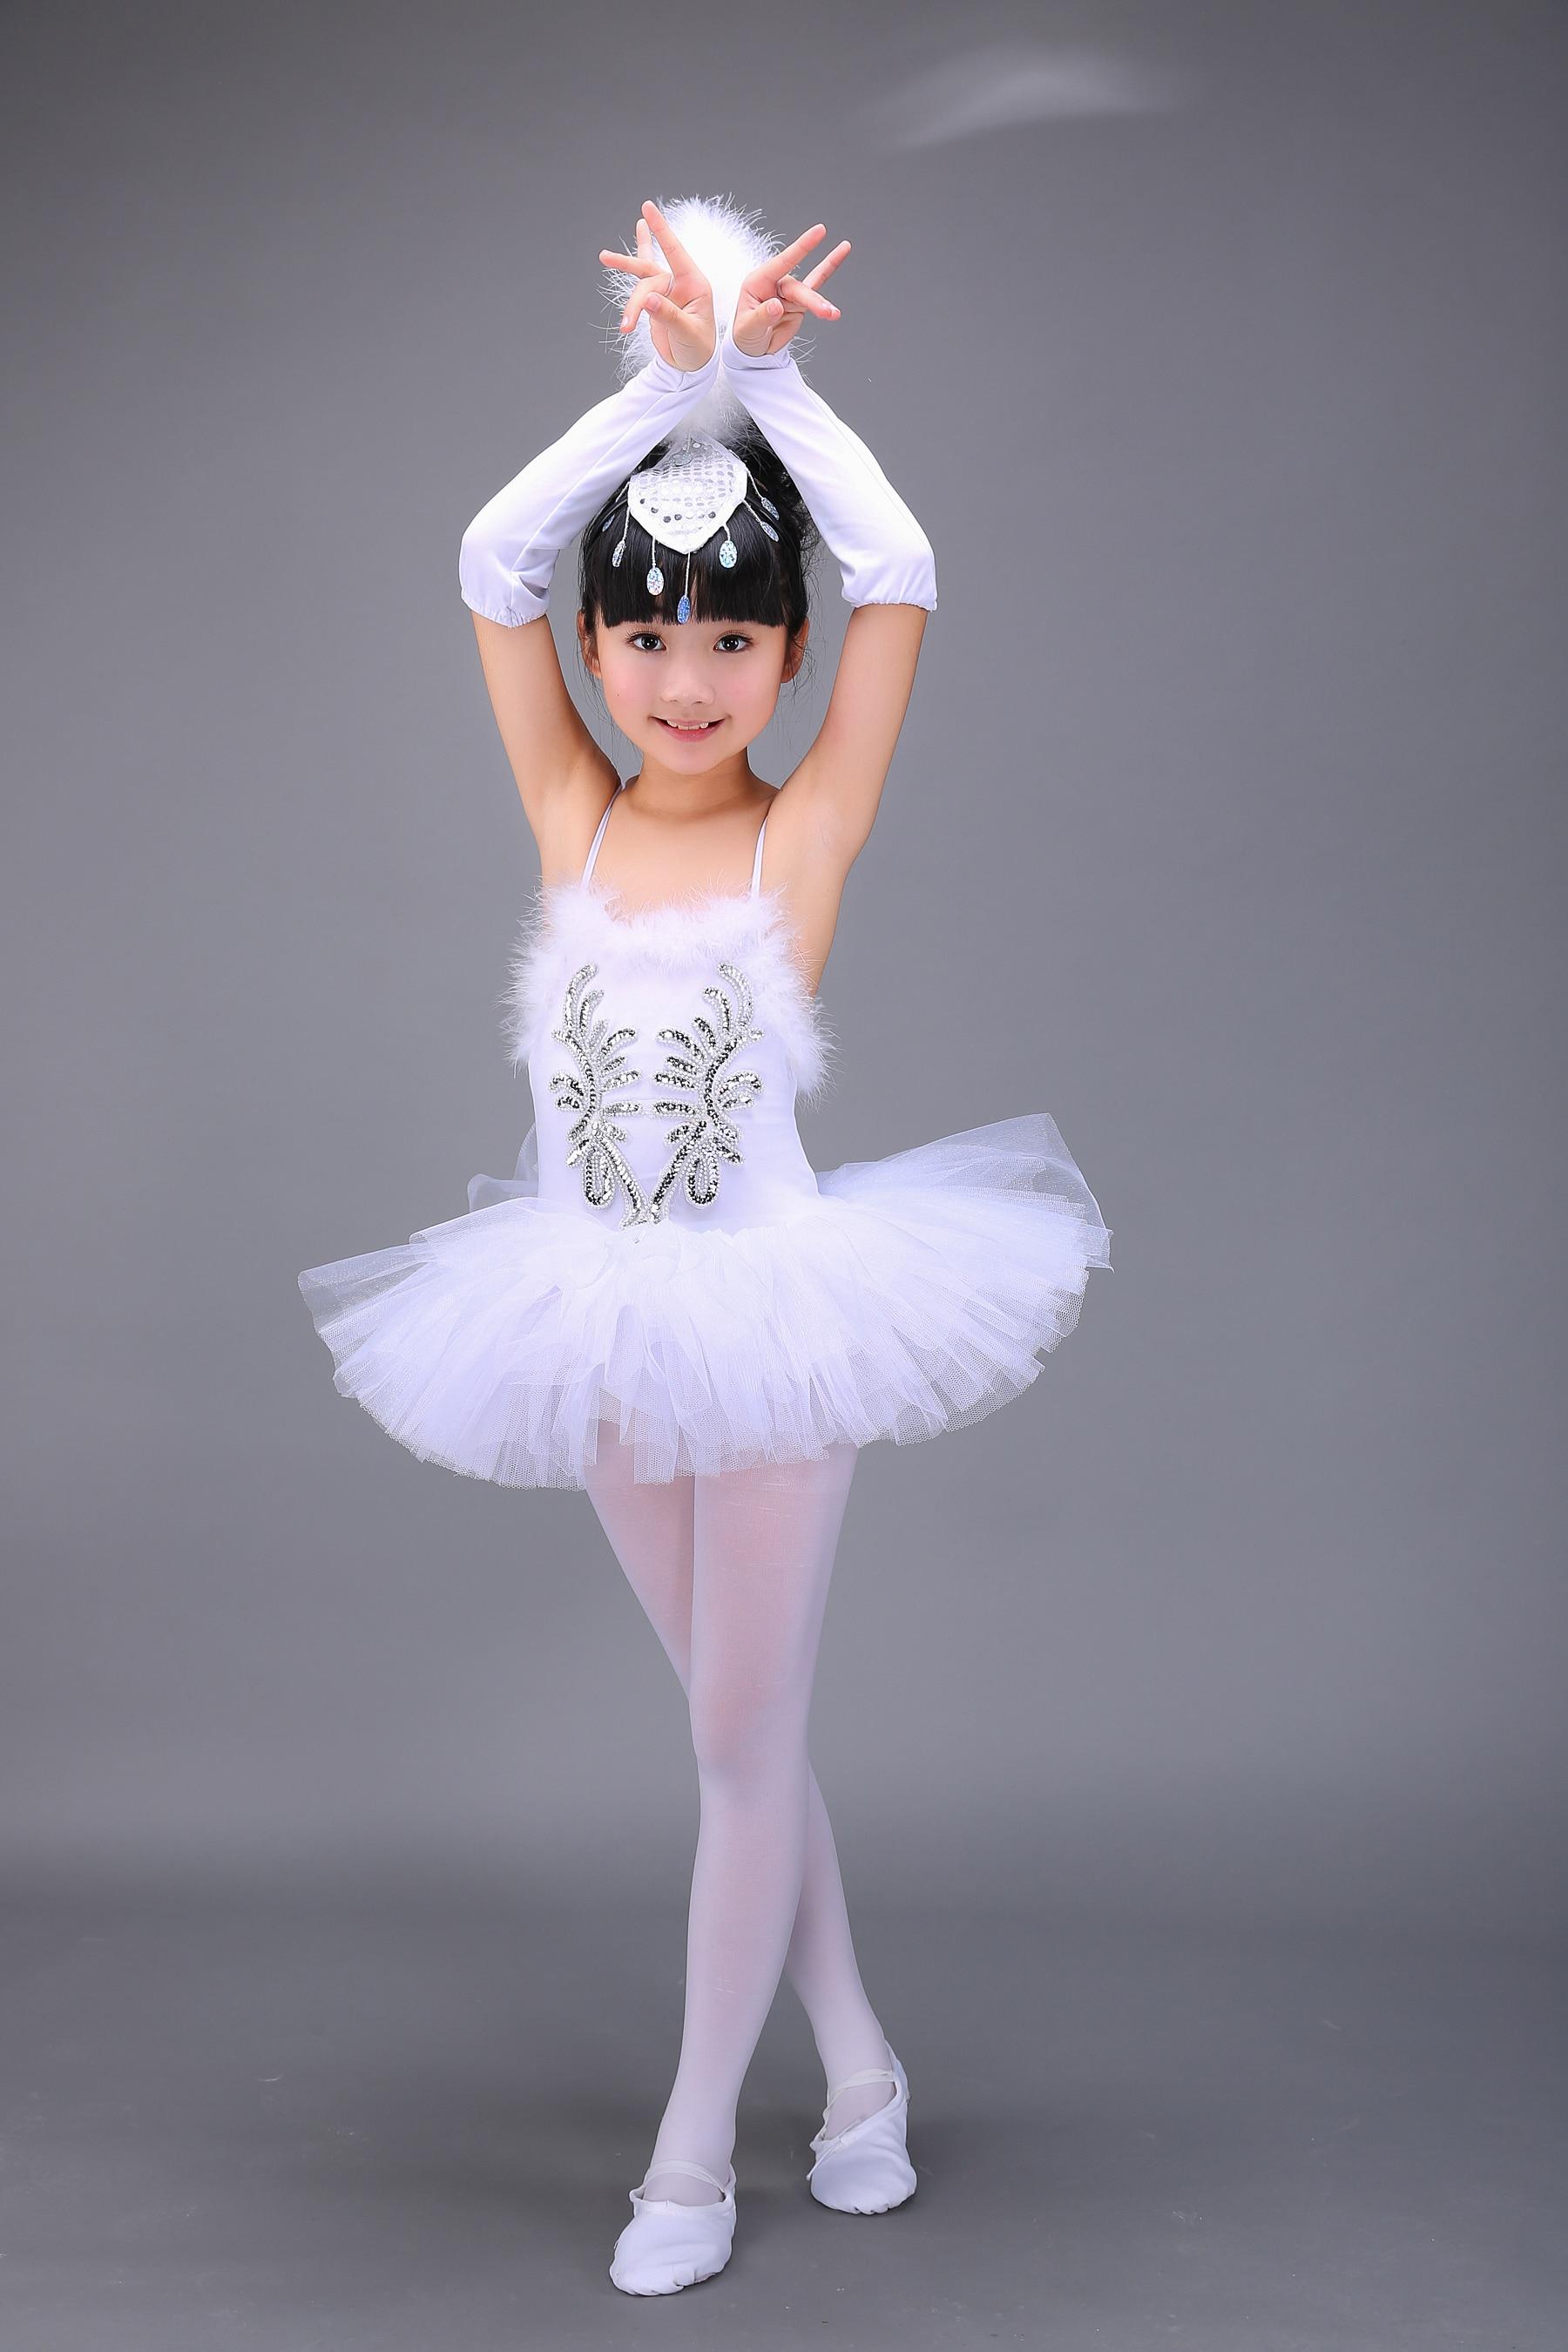 Sexy White Girl Dancing